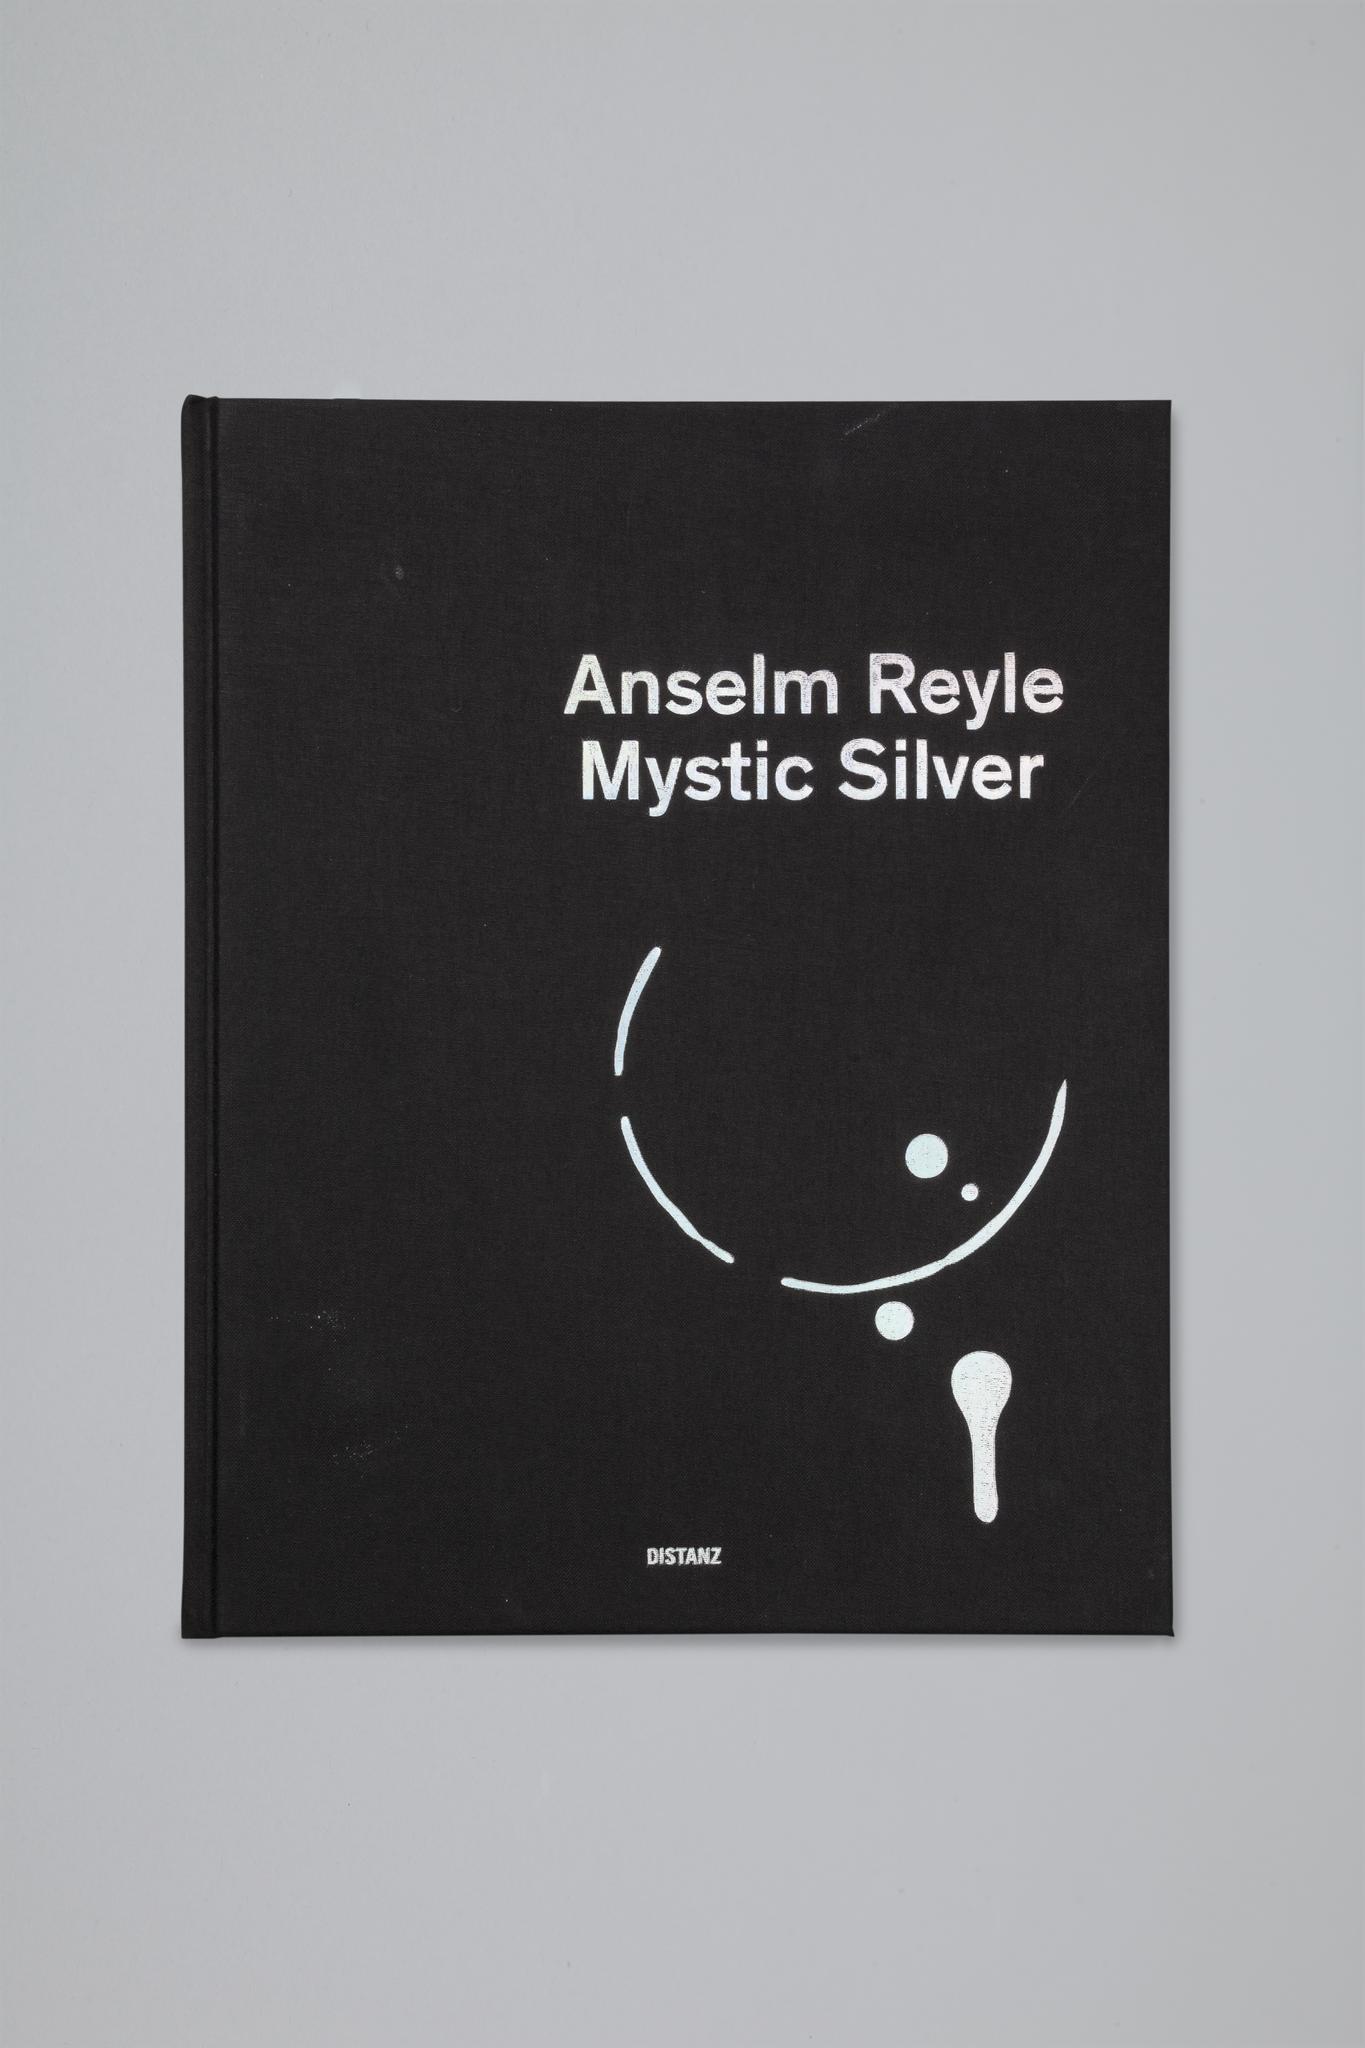 Image of Anselm Reyle - Mystic Silver